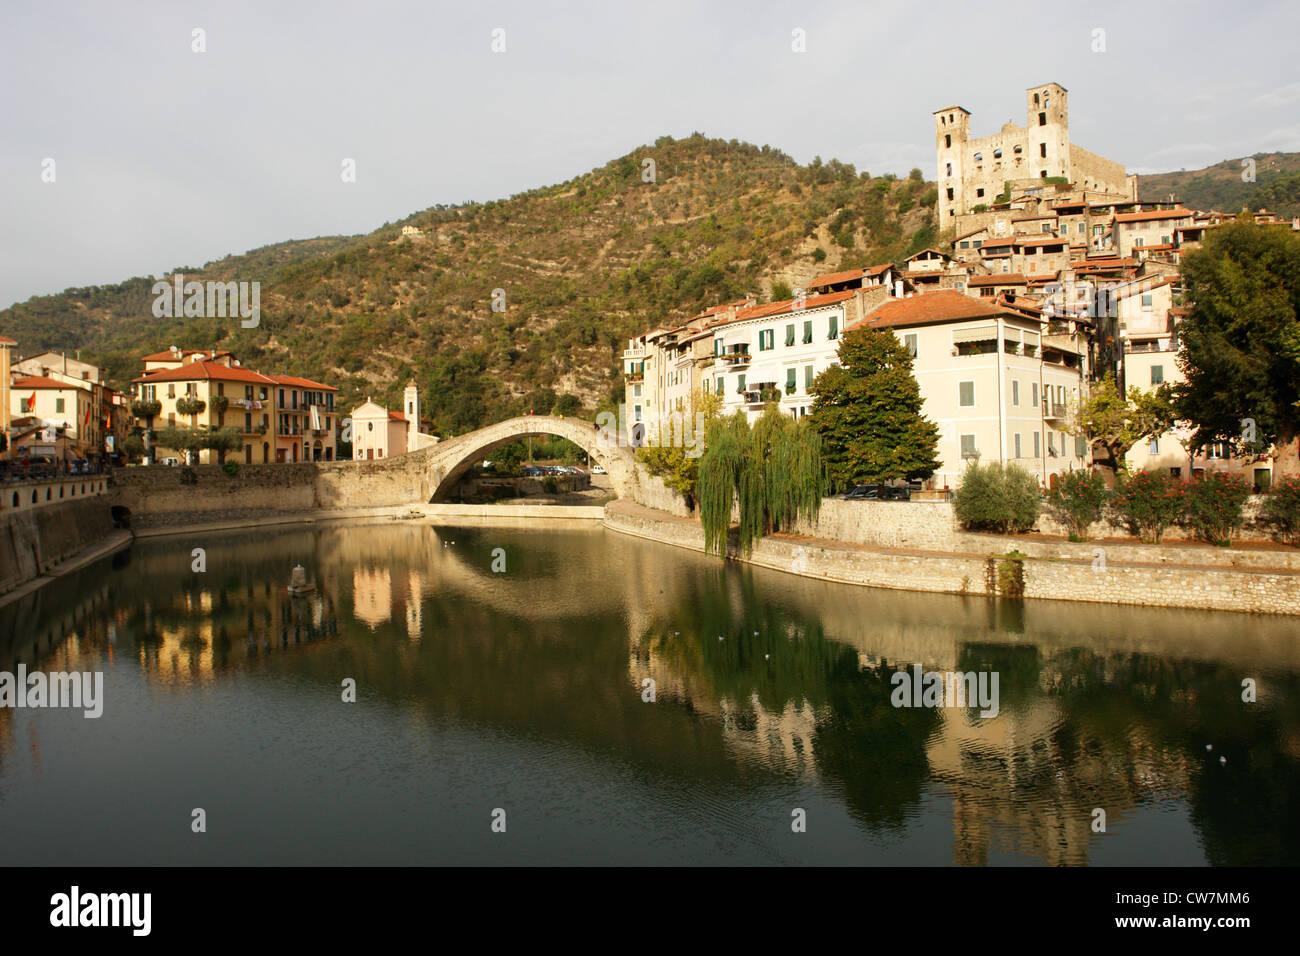 dolce aqua  dolceaqua Italy - Stock Image